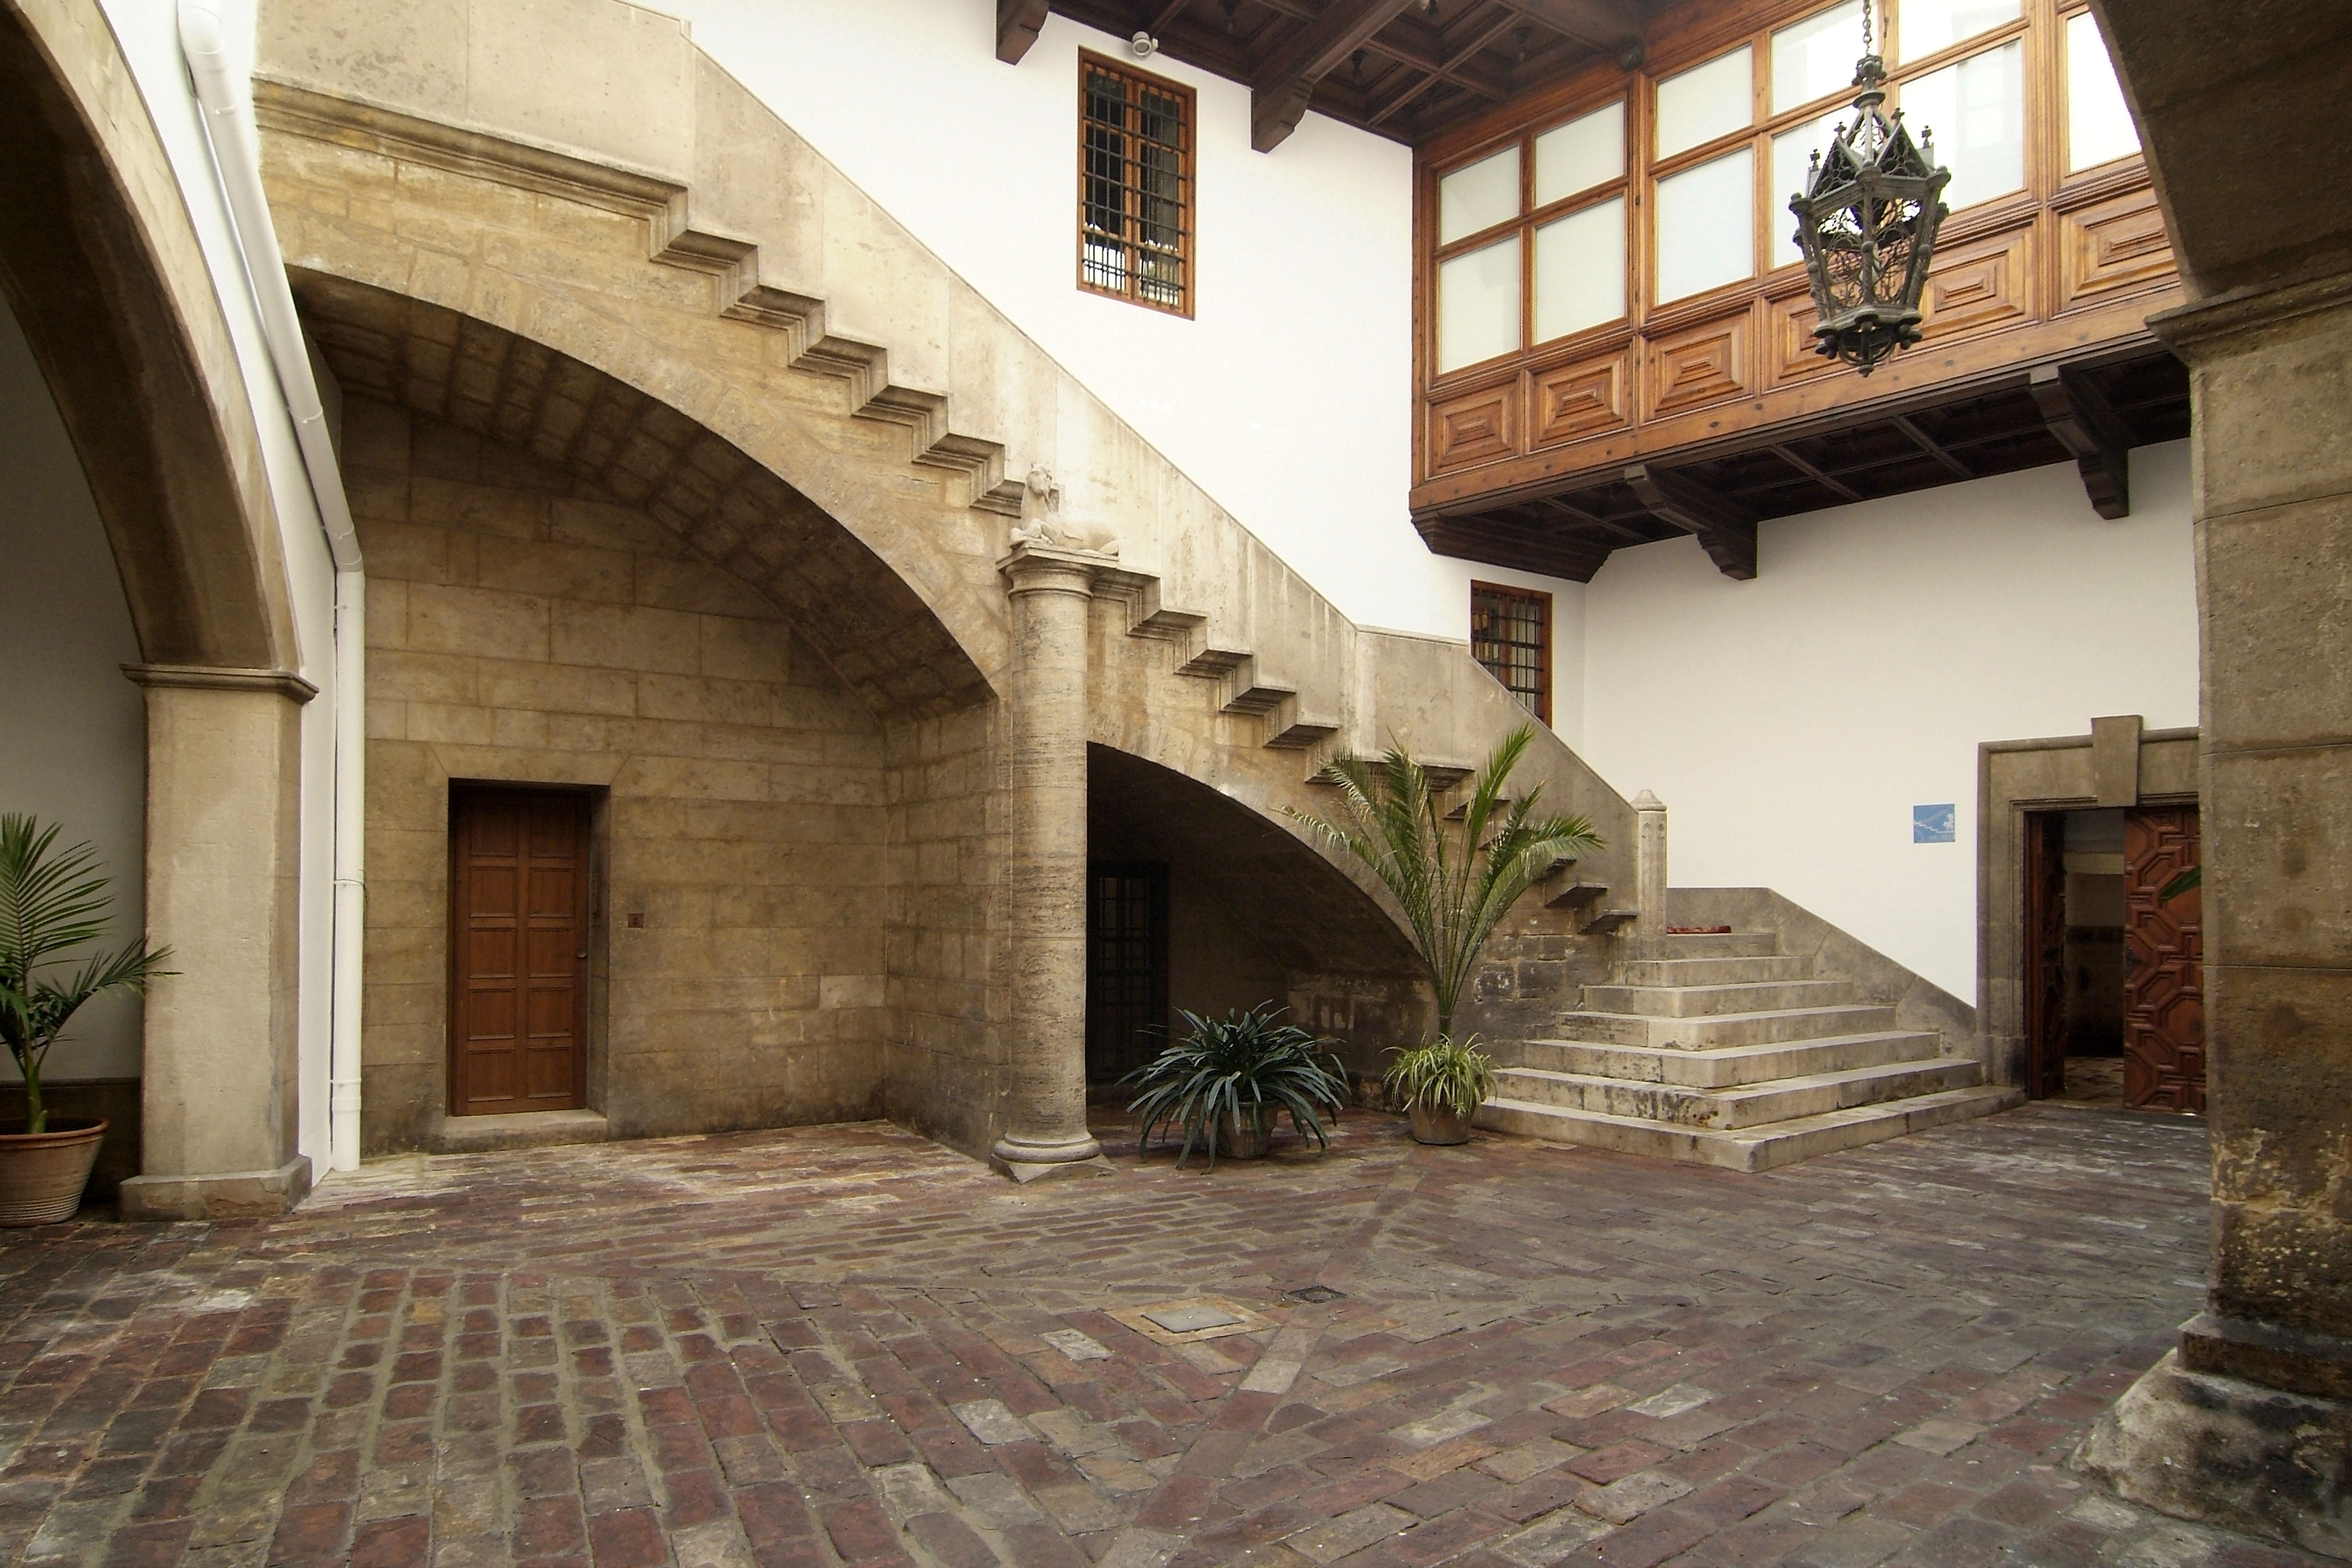 patio-gotico-2-liber-palacio-de-malferit